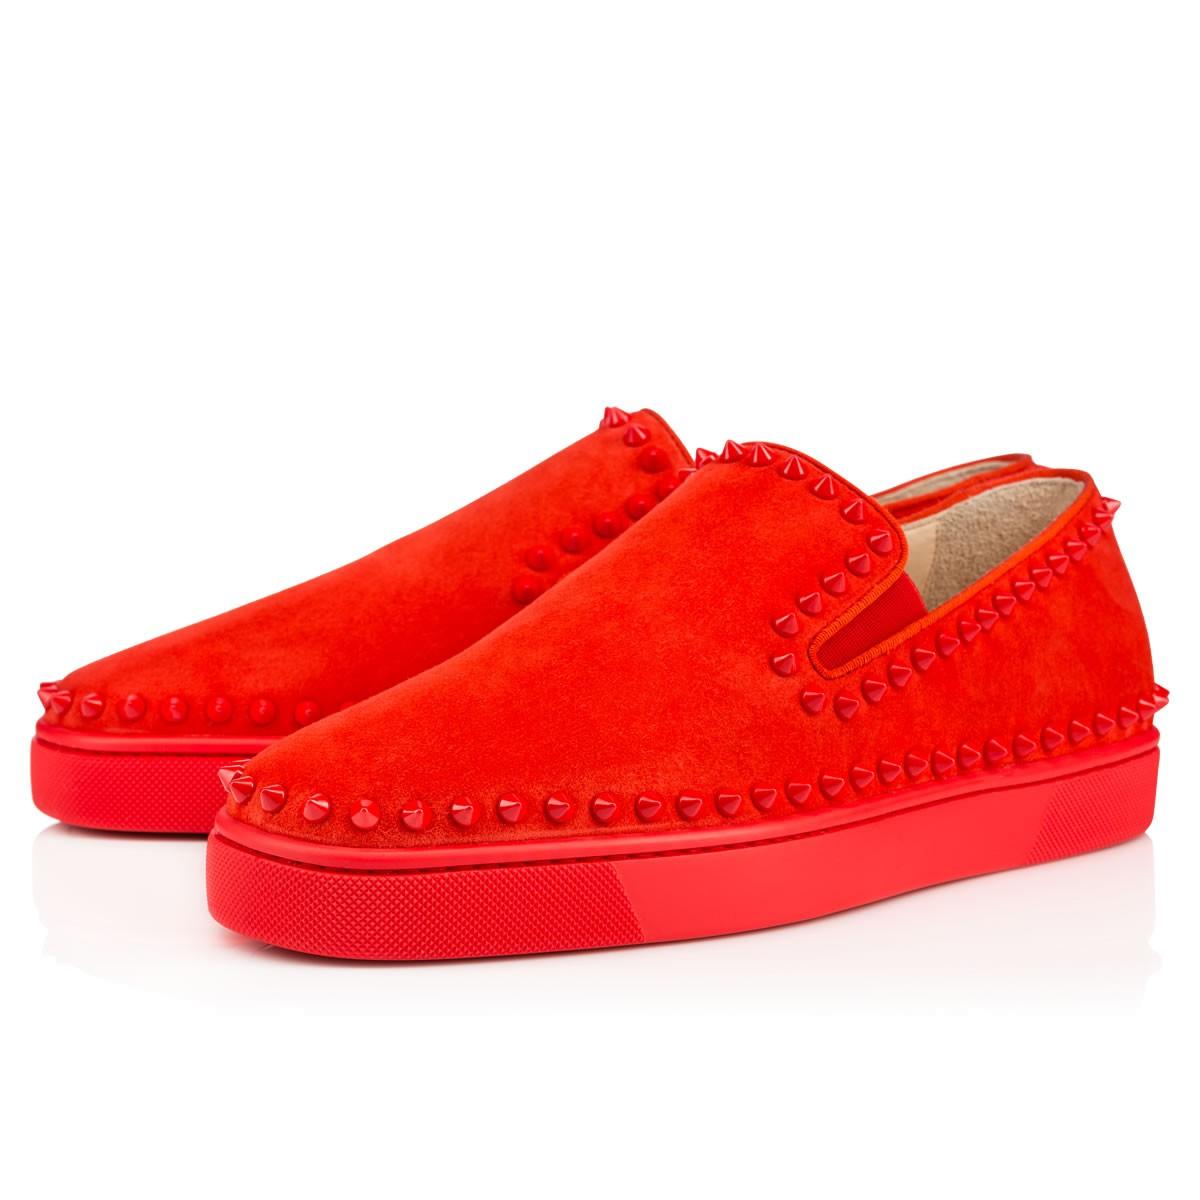 price of christian louboutin shoes - christian louboutin pik boat woman\u0026#39;s flat | cosmetics digital ...